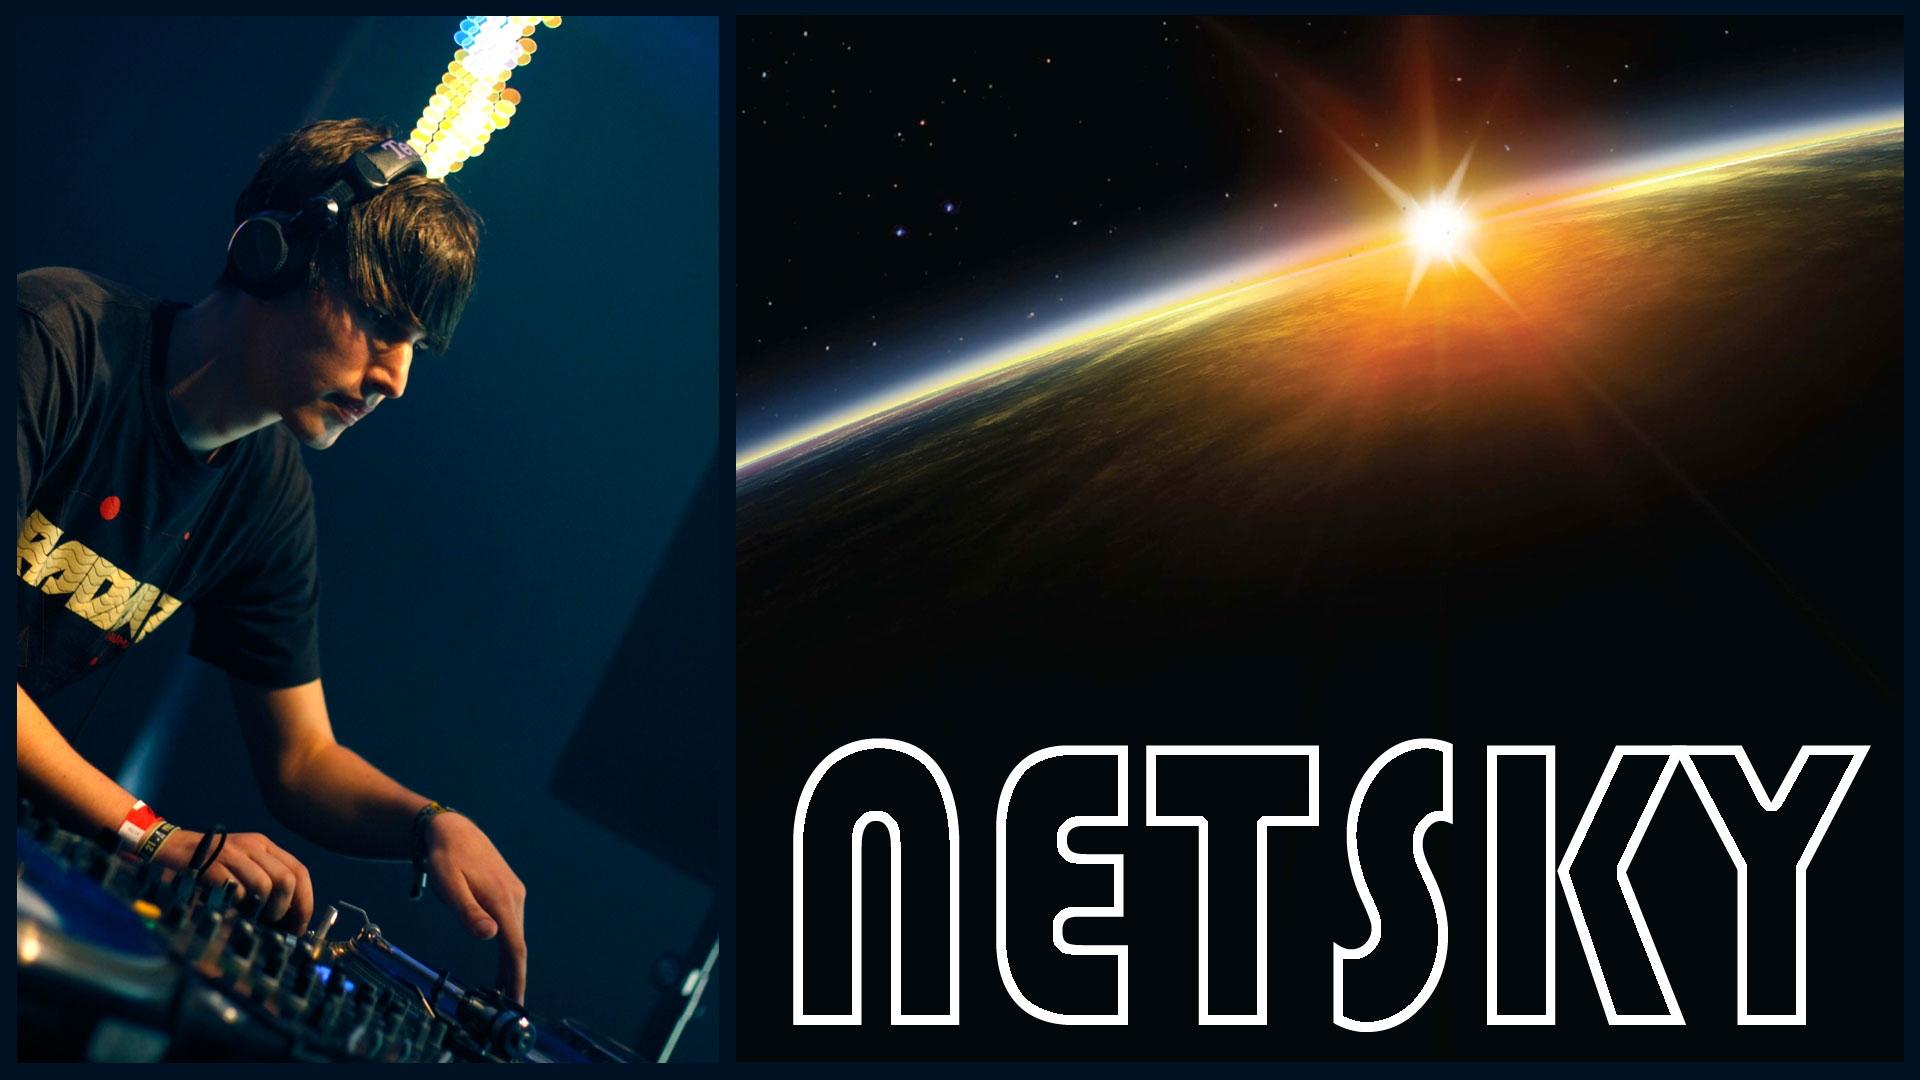 1280x720 netsky man earth 720P Wallpaper HD Music 4K Wallpapers 1920x1080